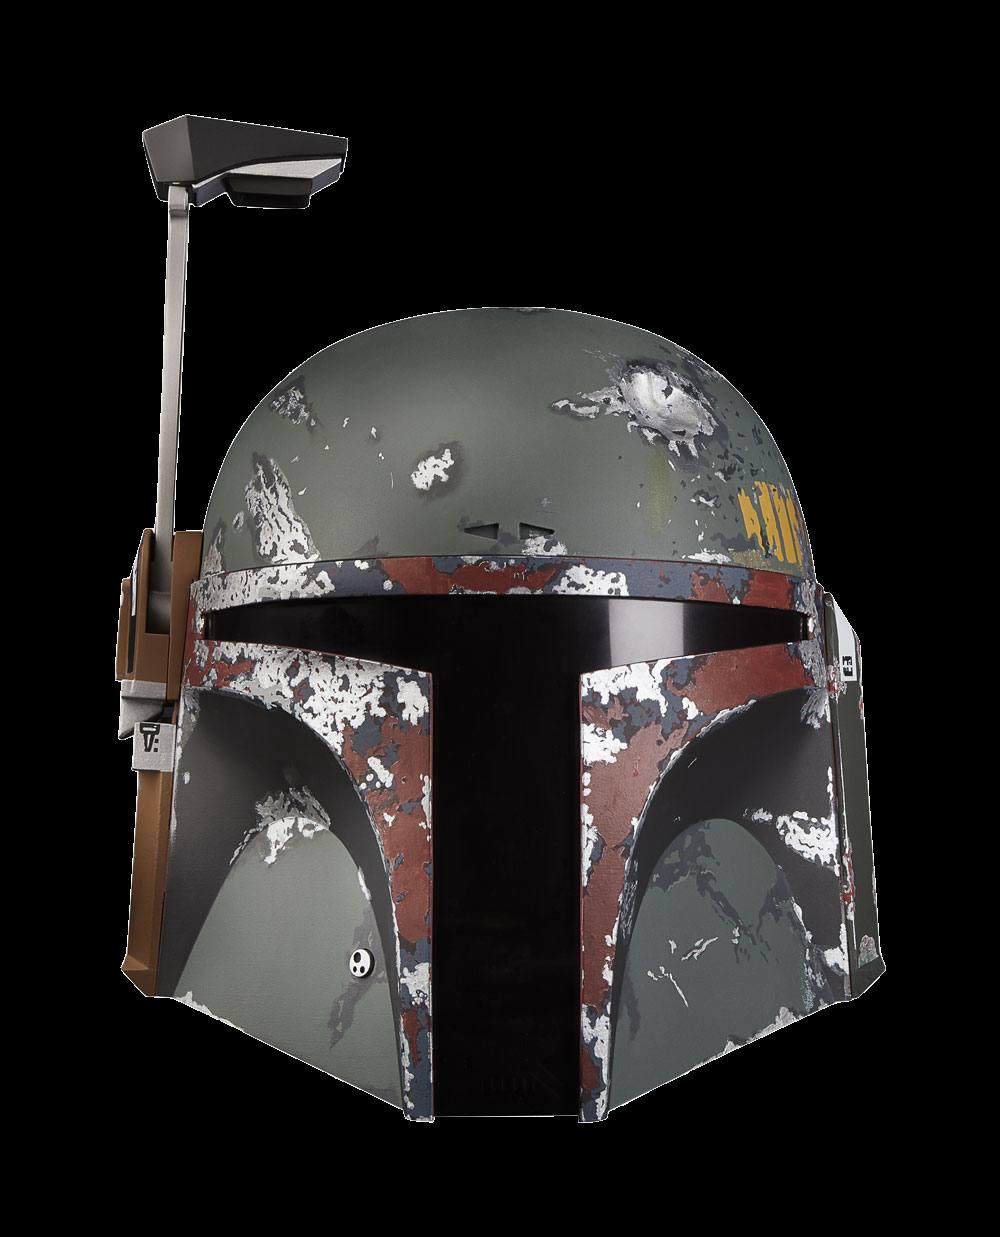 hasbro-star-wars-boba-fett-electronic-helmet-lifesize-replica-toyslife